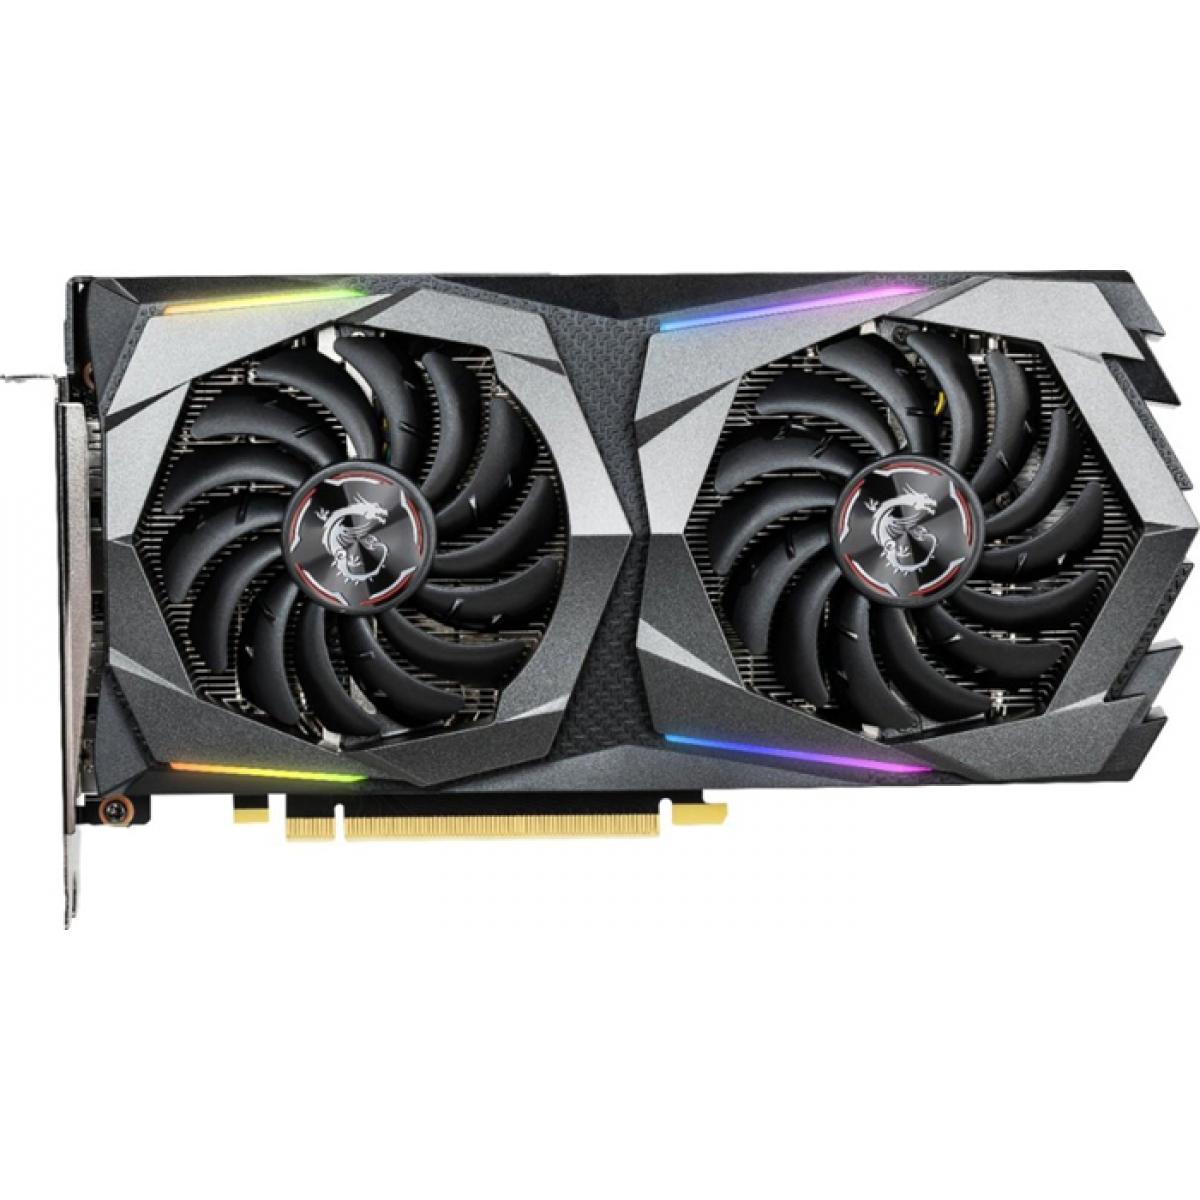 Placa de Vídeo Msi GeForce GTX 1660 Ti GAMING X Dual, 6GB GDDR6, 192Bit